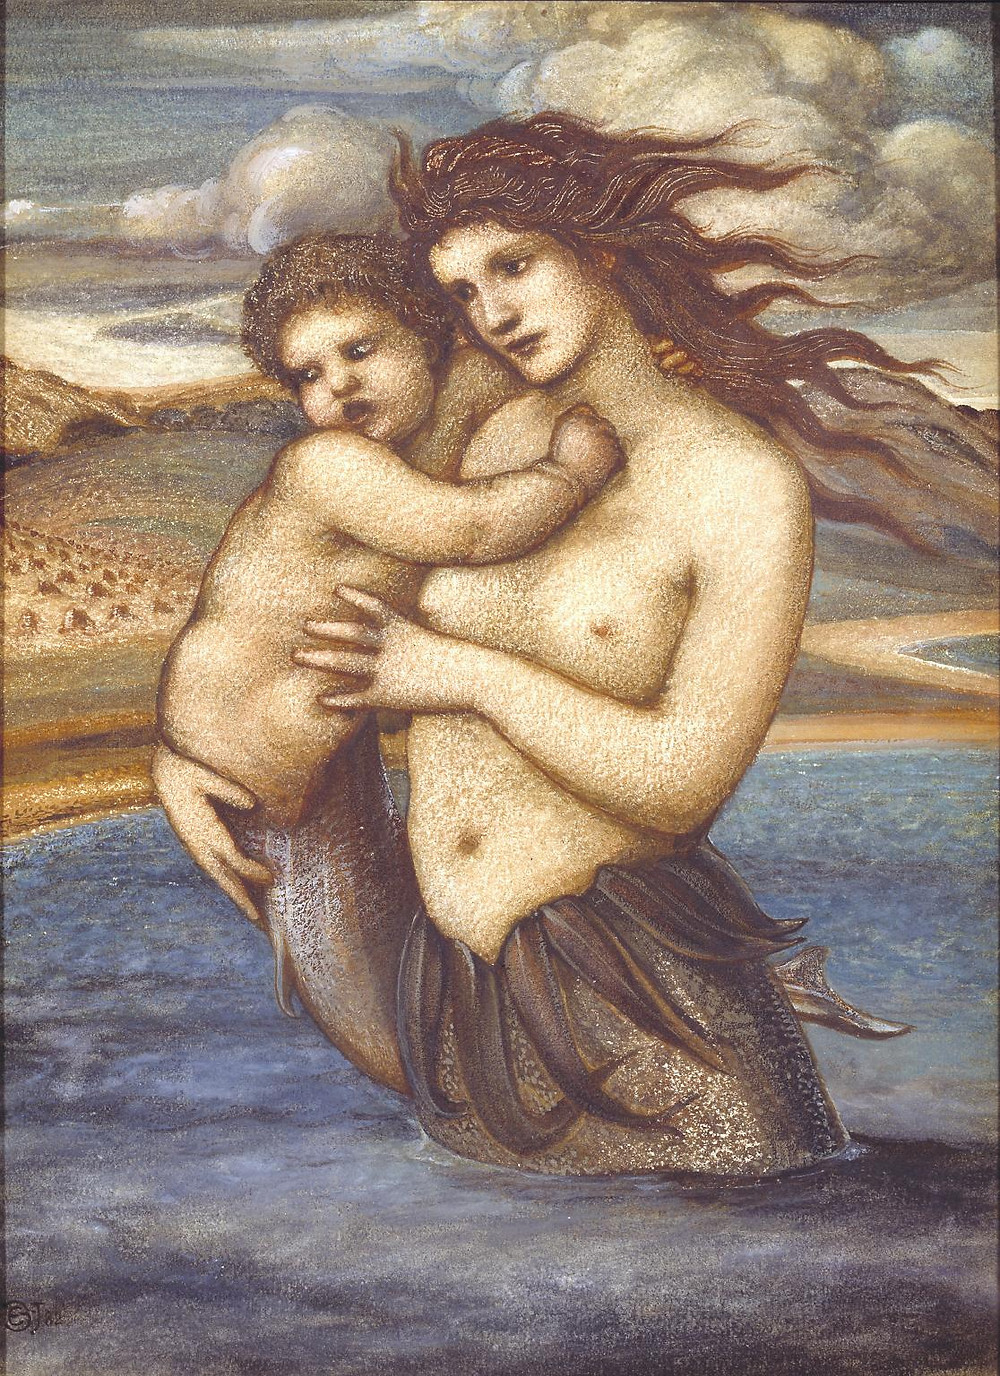 Сэр Эдвард Коли Бёрн-Джонс, Русалка 1882. Sir Edward Coley Burne-Jones, Bt  The Mermaid 1882